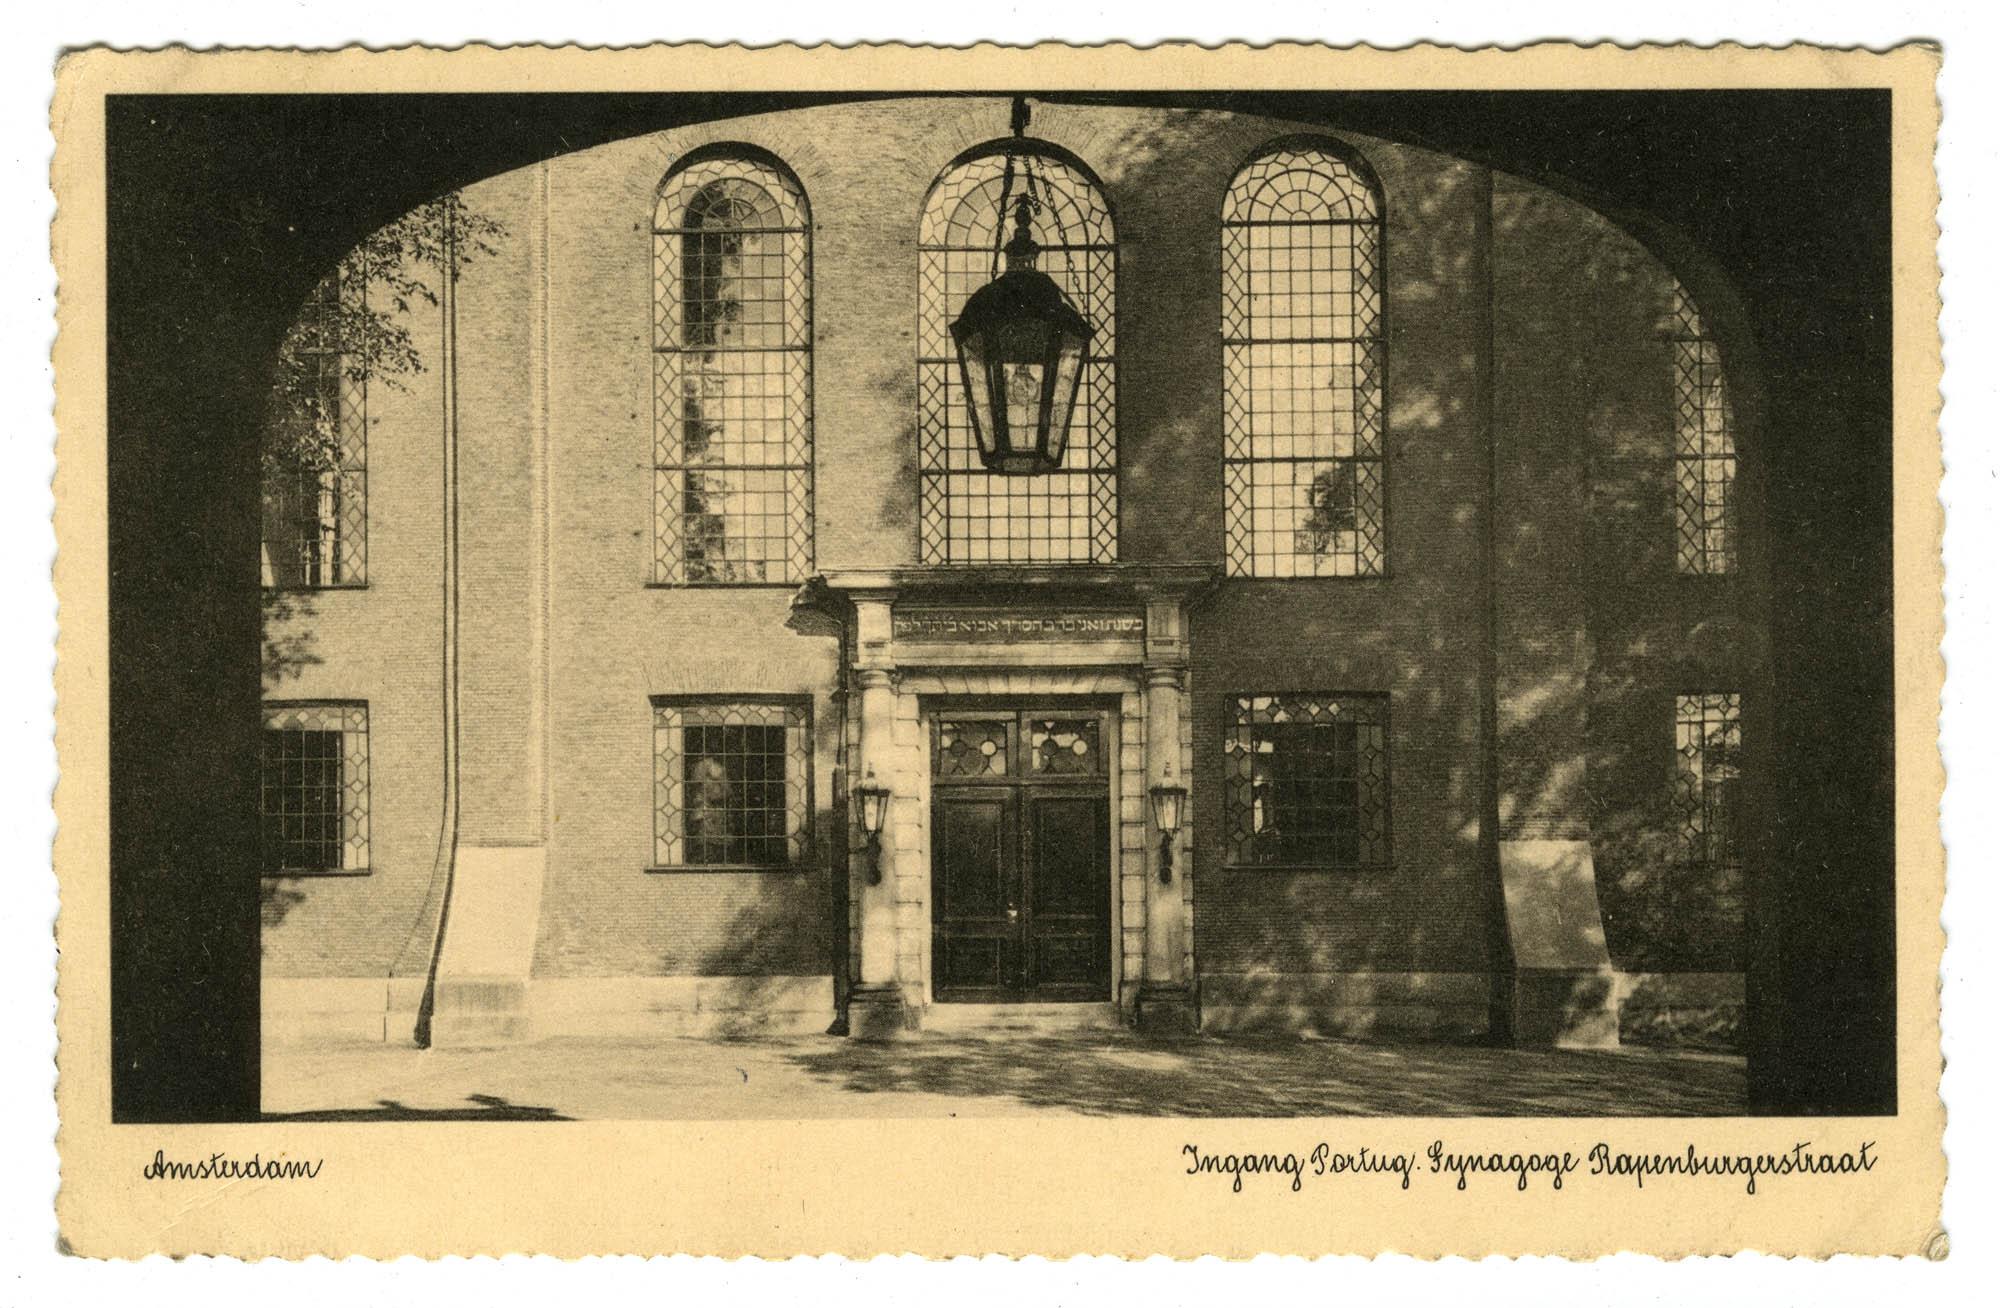 Amsterdam, Ingang Portug. Synagoge Rapenburgerstraat